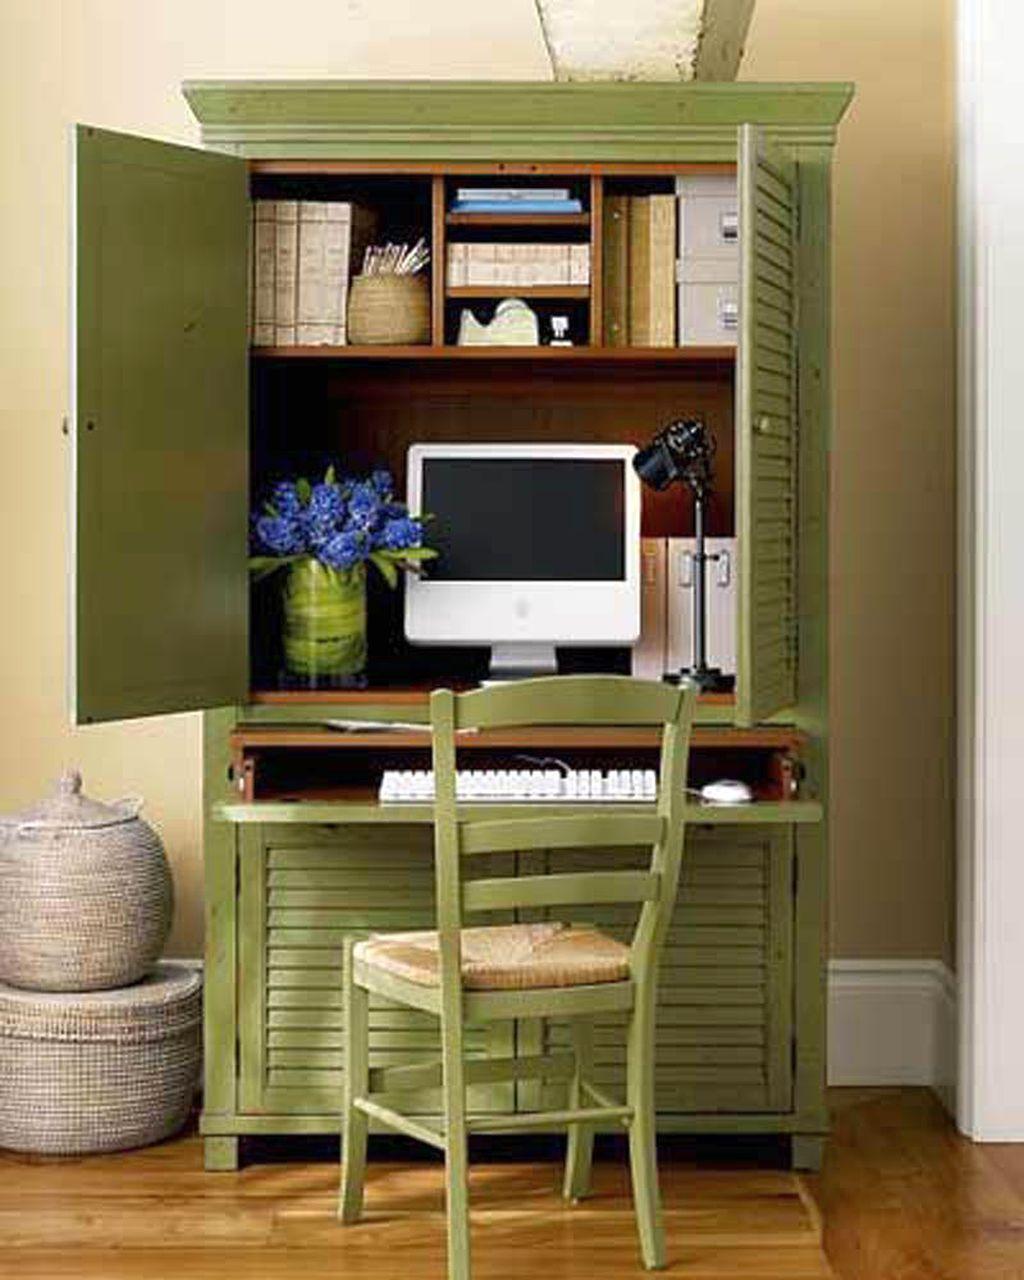 bufet-verde-amenajat-drept-birou-cu-scaun-din-lemn-asortat